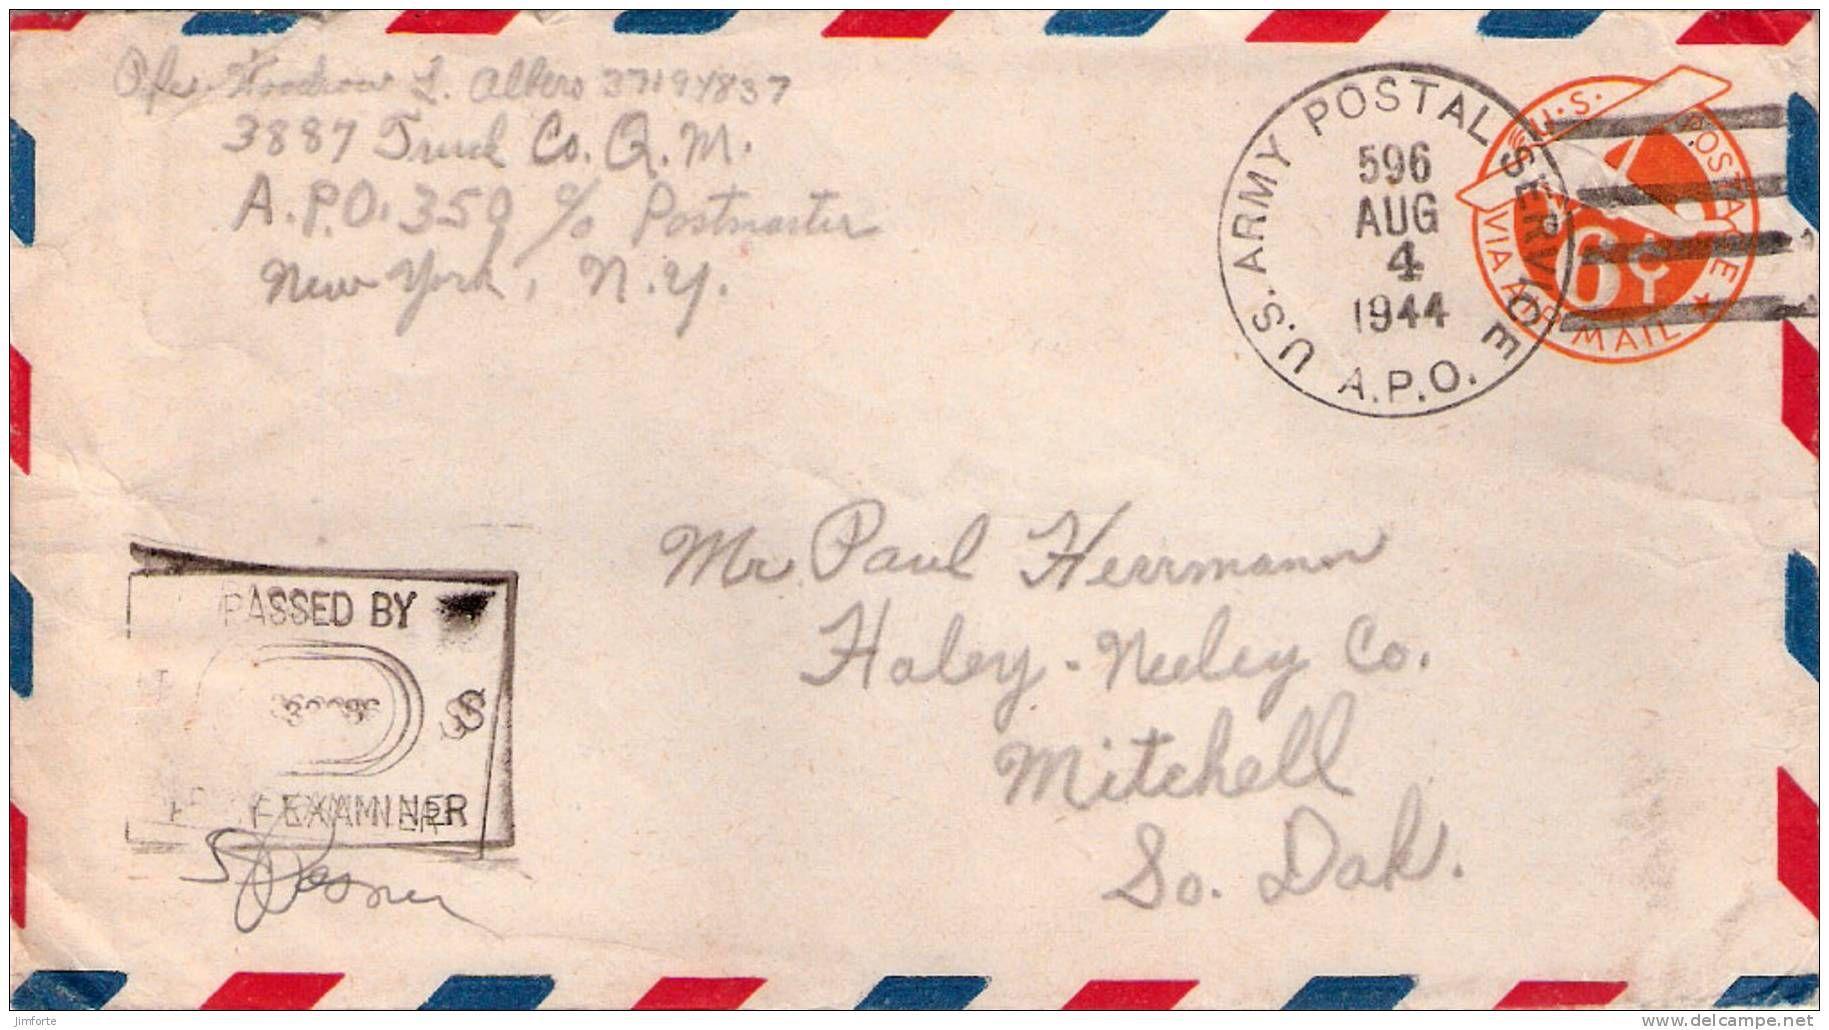 Vintage Us Postal Envelopes Bing Images Postal Postal Service Trucking Companies